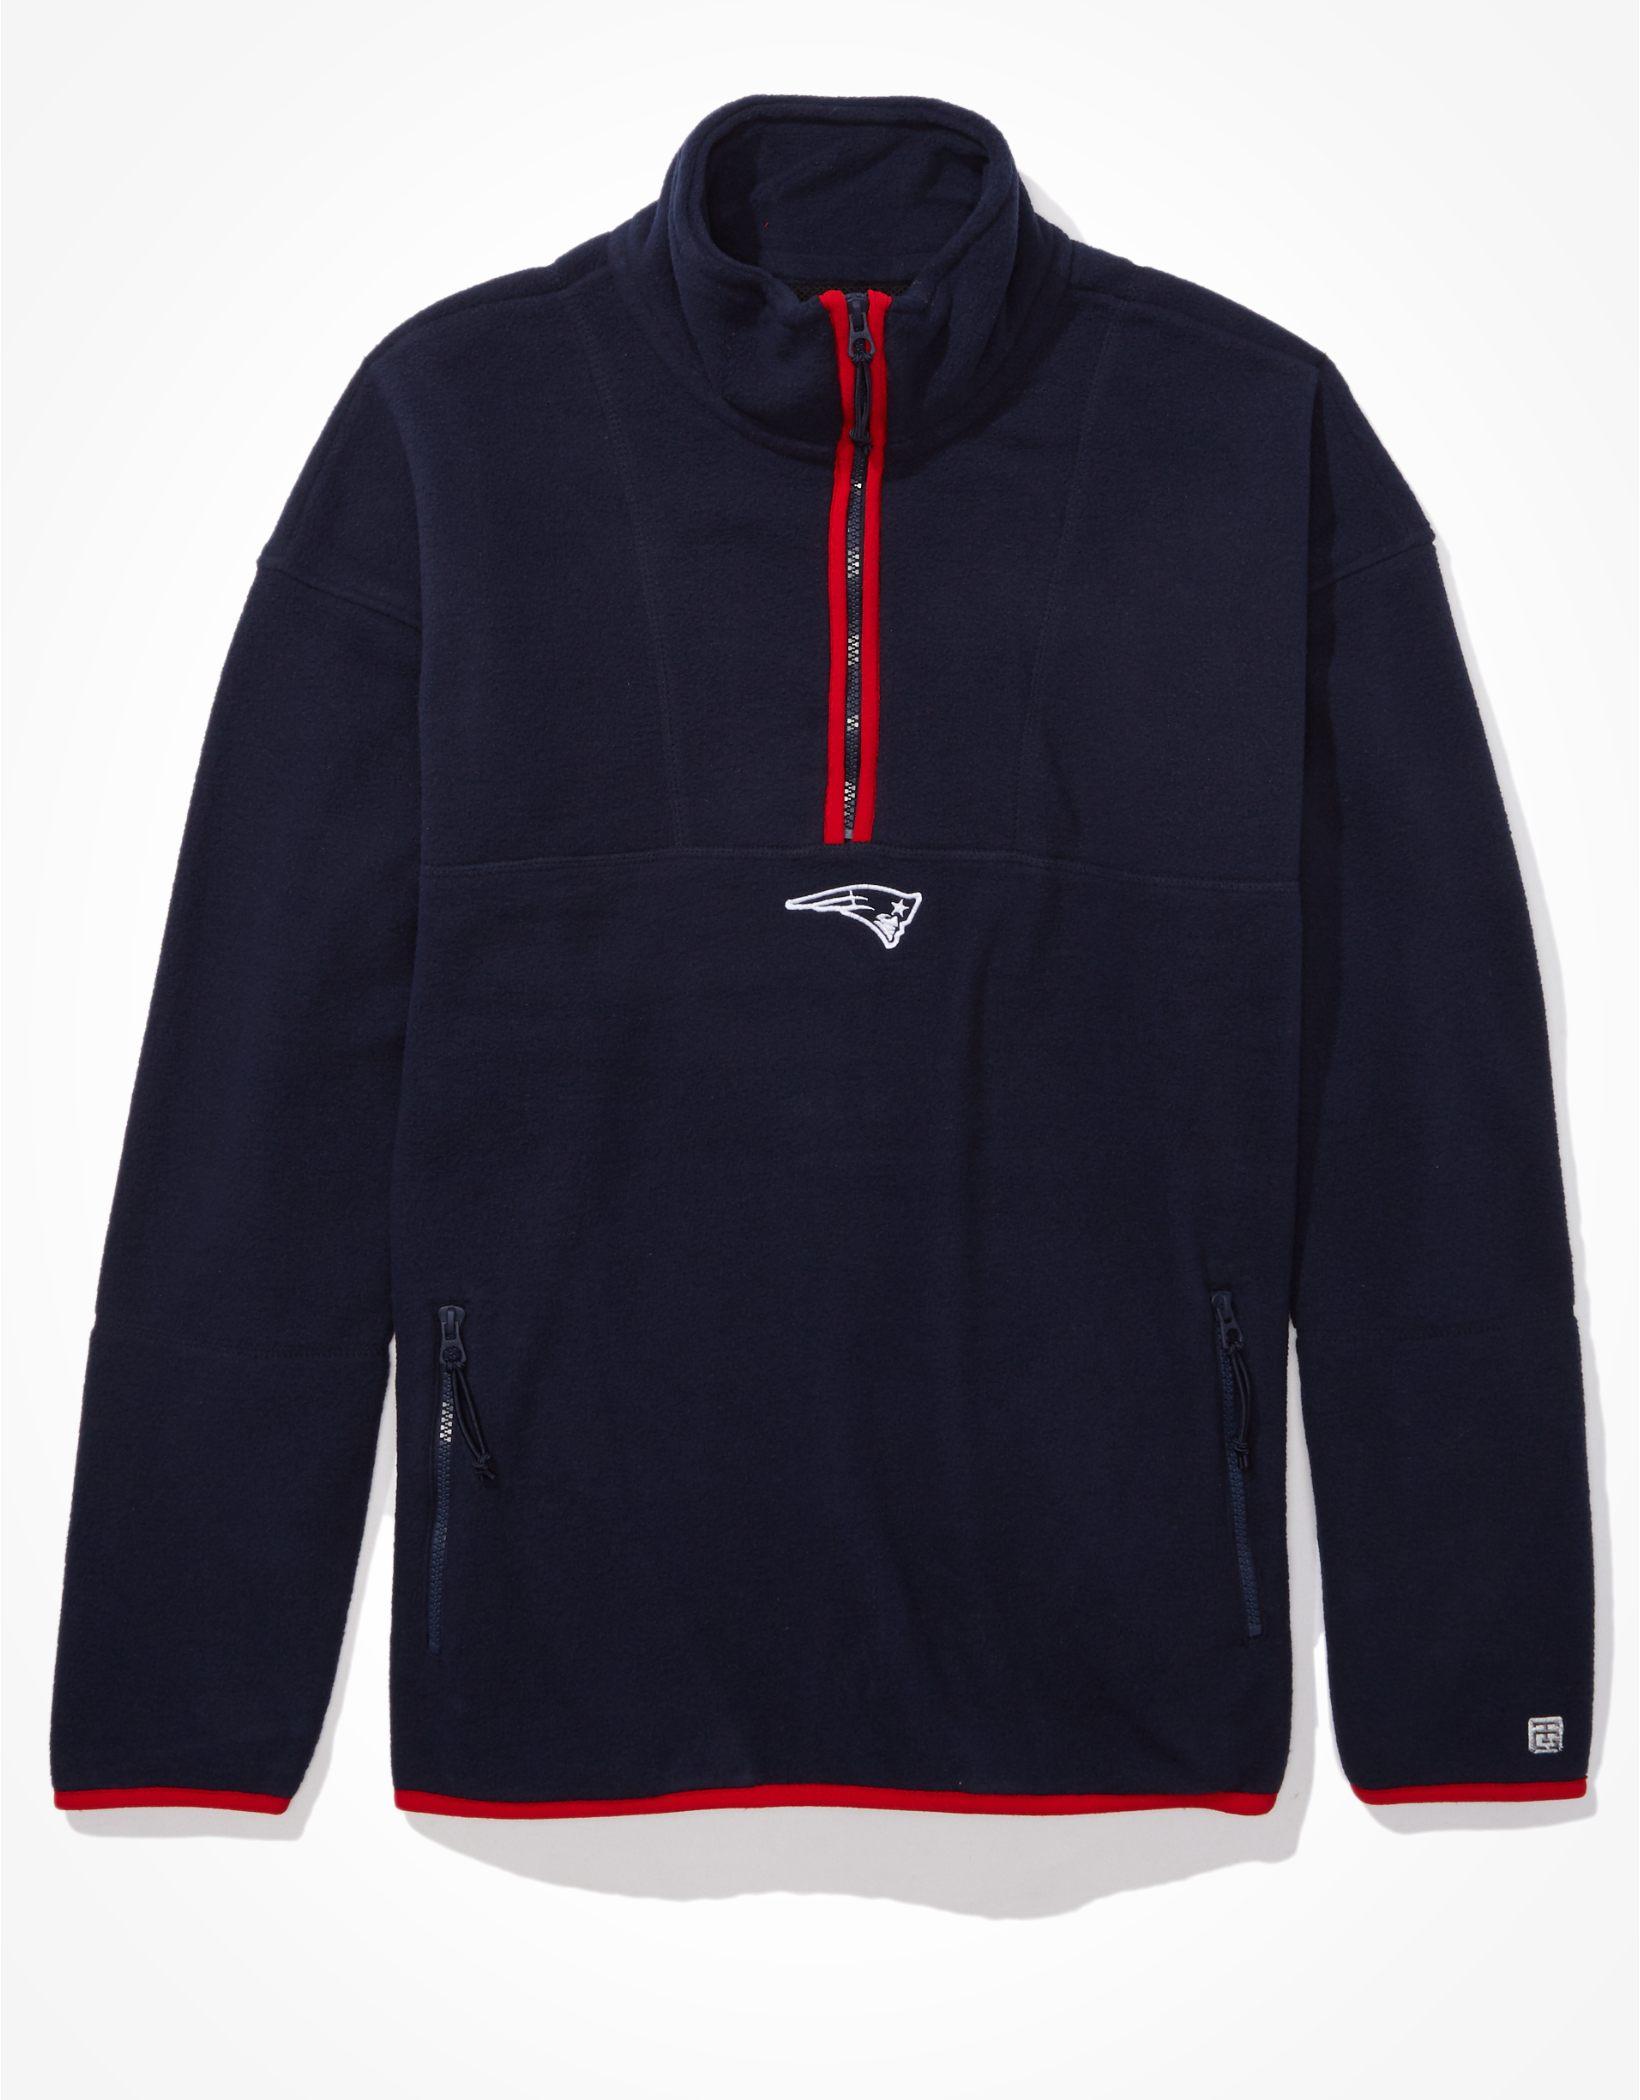 Tailgate Men's New England Patriots Microfleece Sweatshirt